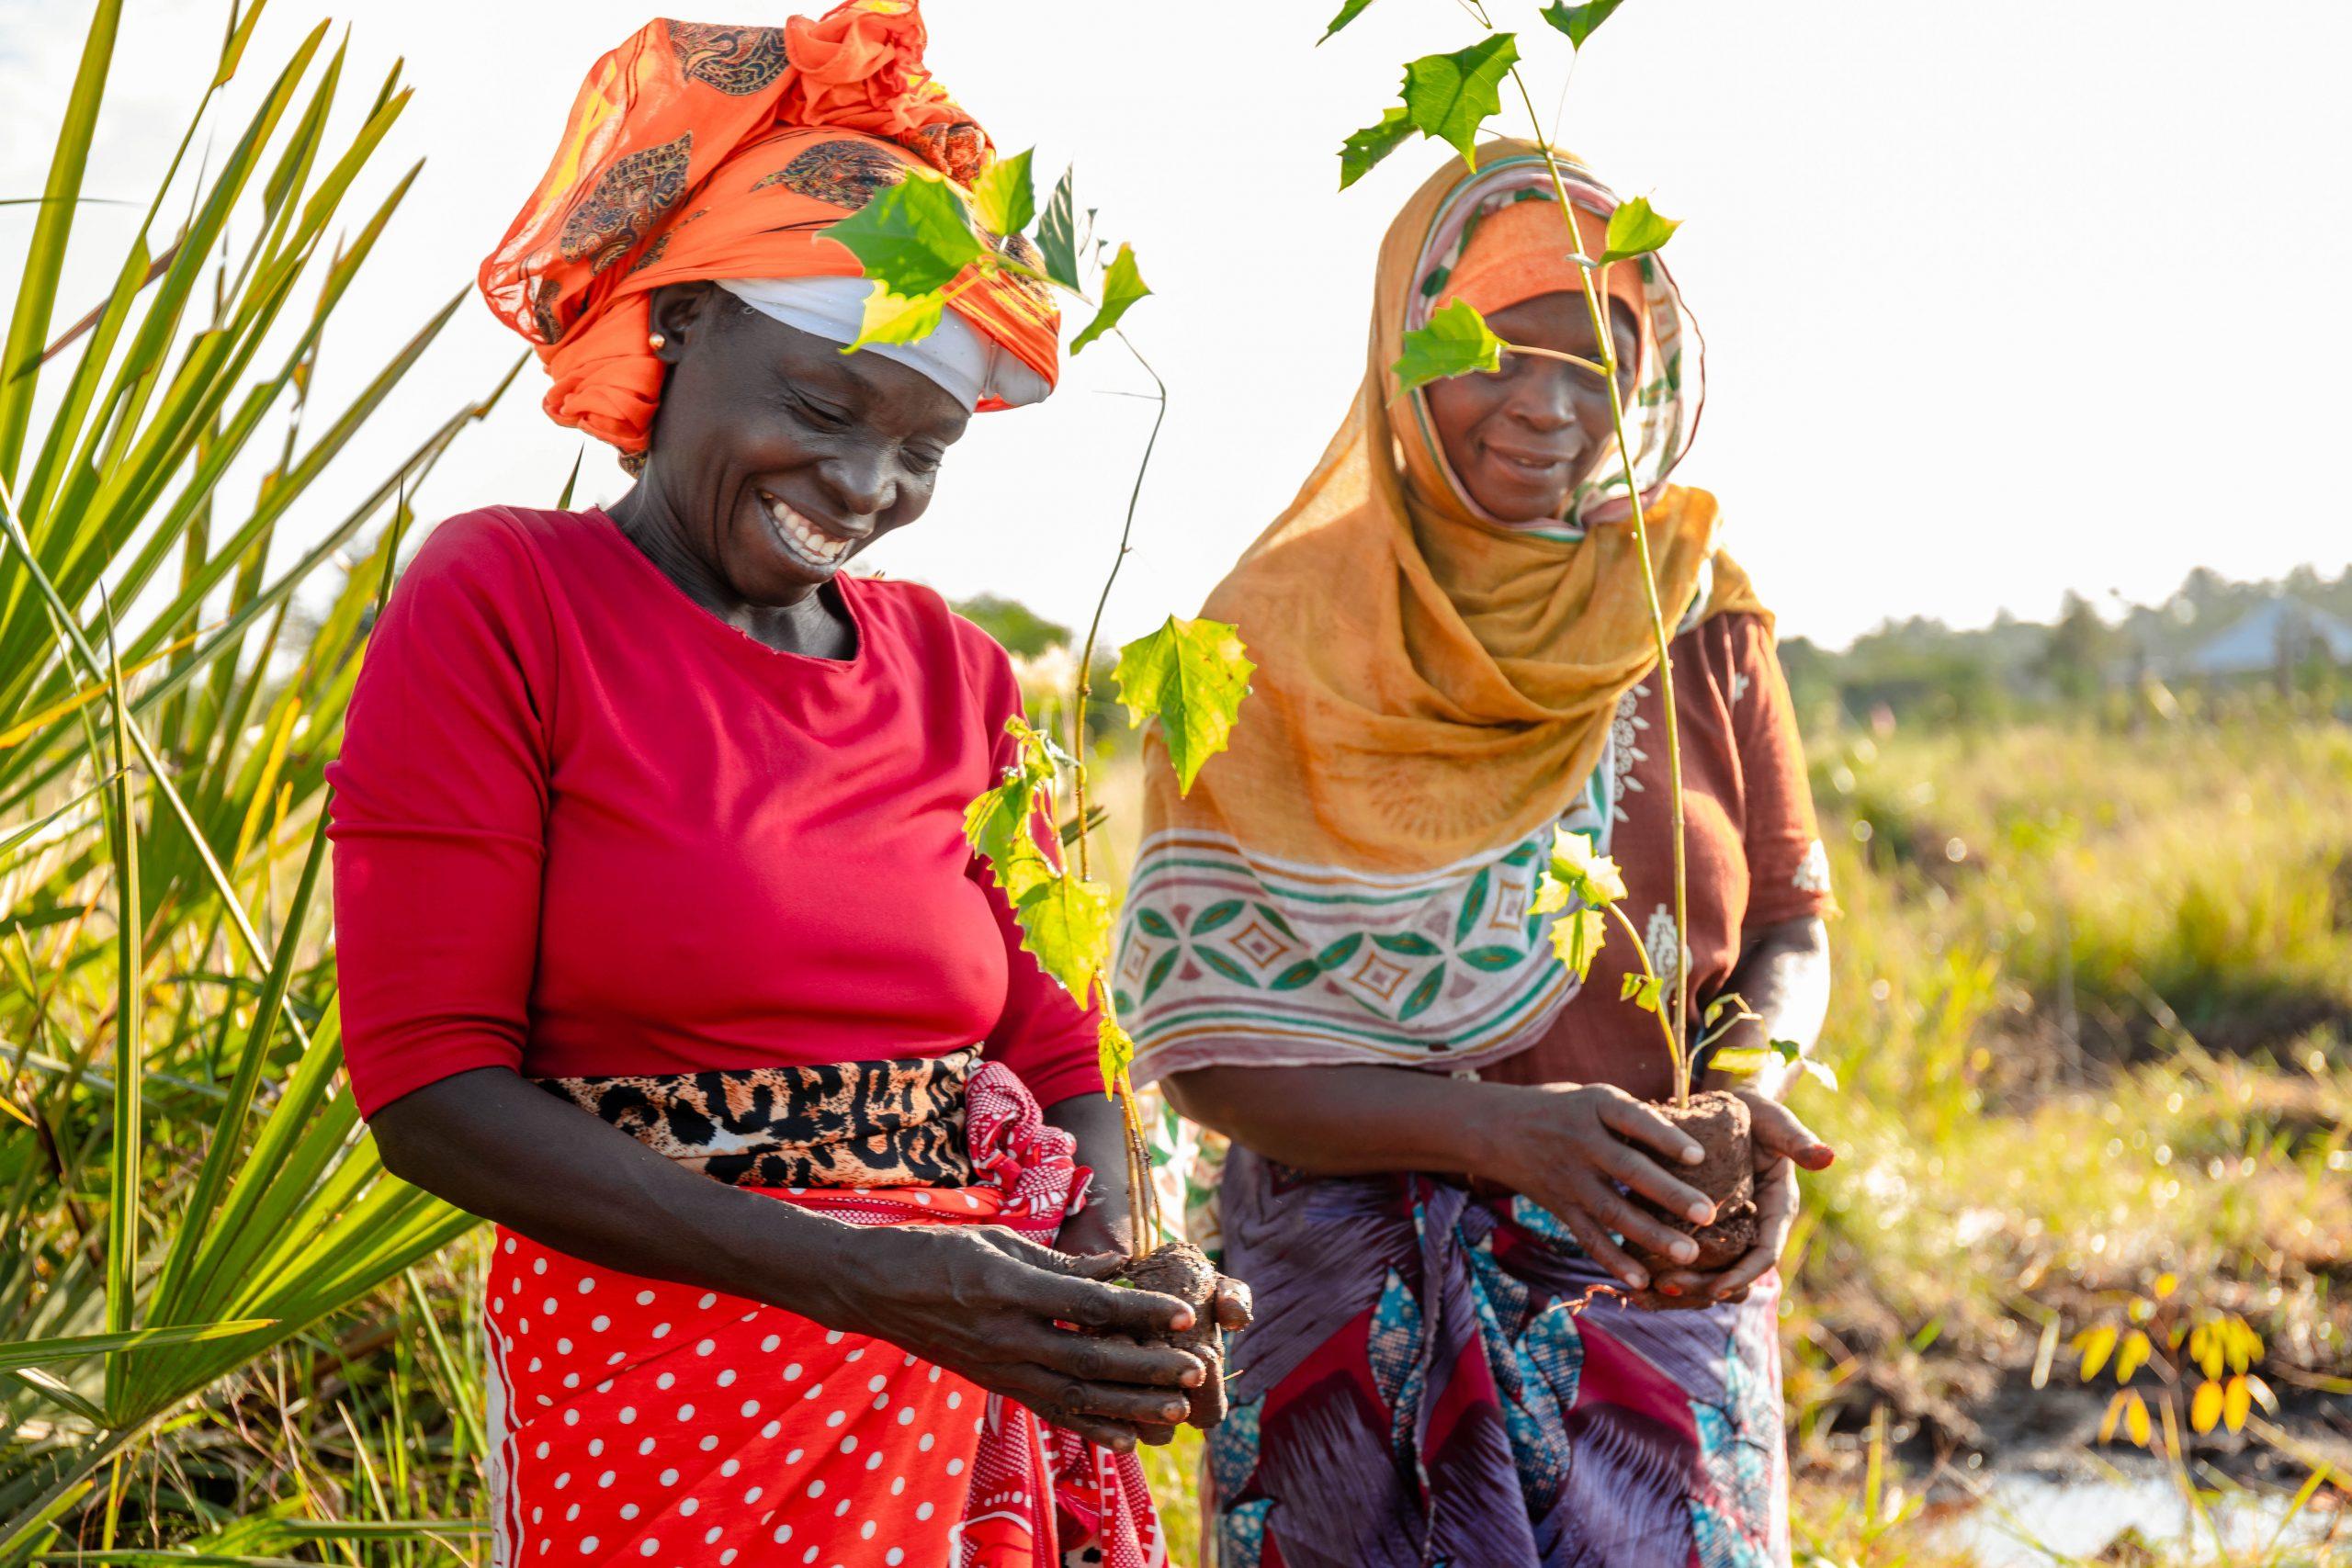 Local women planting trees, Tanzania